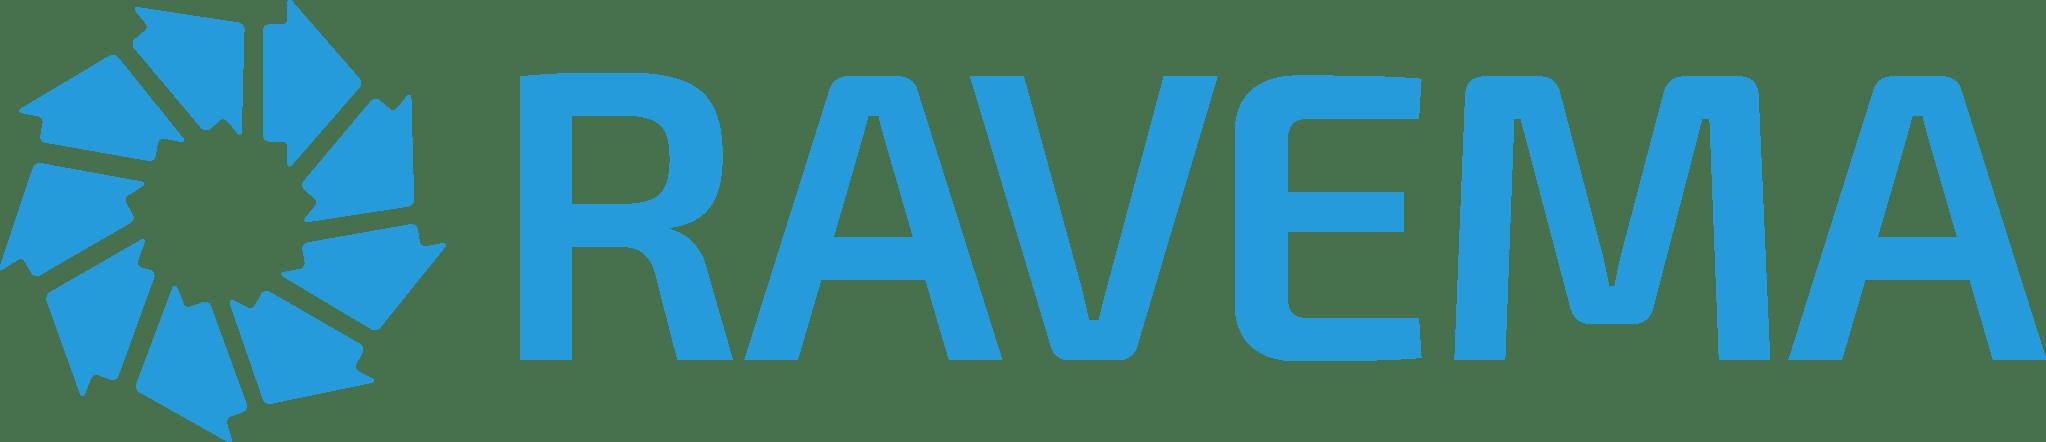 937, 937, ravema-logo, ravema-logo.png, 42303, https://starrett-metrology.co.uk/wp-content/uploads/2020/02/ravema-logo.png, https://starrett-metrology.co.uk/distributor/ravema-logo/, , 4, , , ravema-logo, inherit, 261, 2020-02-28 14:38:35, 2020-02-28 14:38:35, 0, image/png, image, png, https://starrett-metrology.co.uk/wp-includes/images/media/default.png, 2046, 442, Array